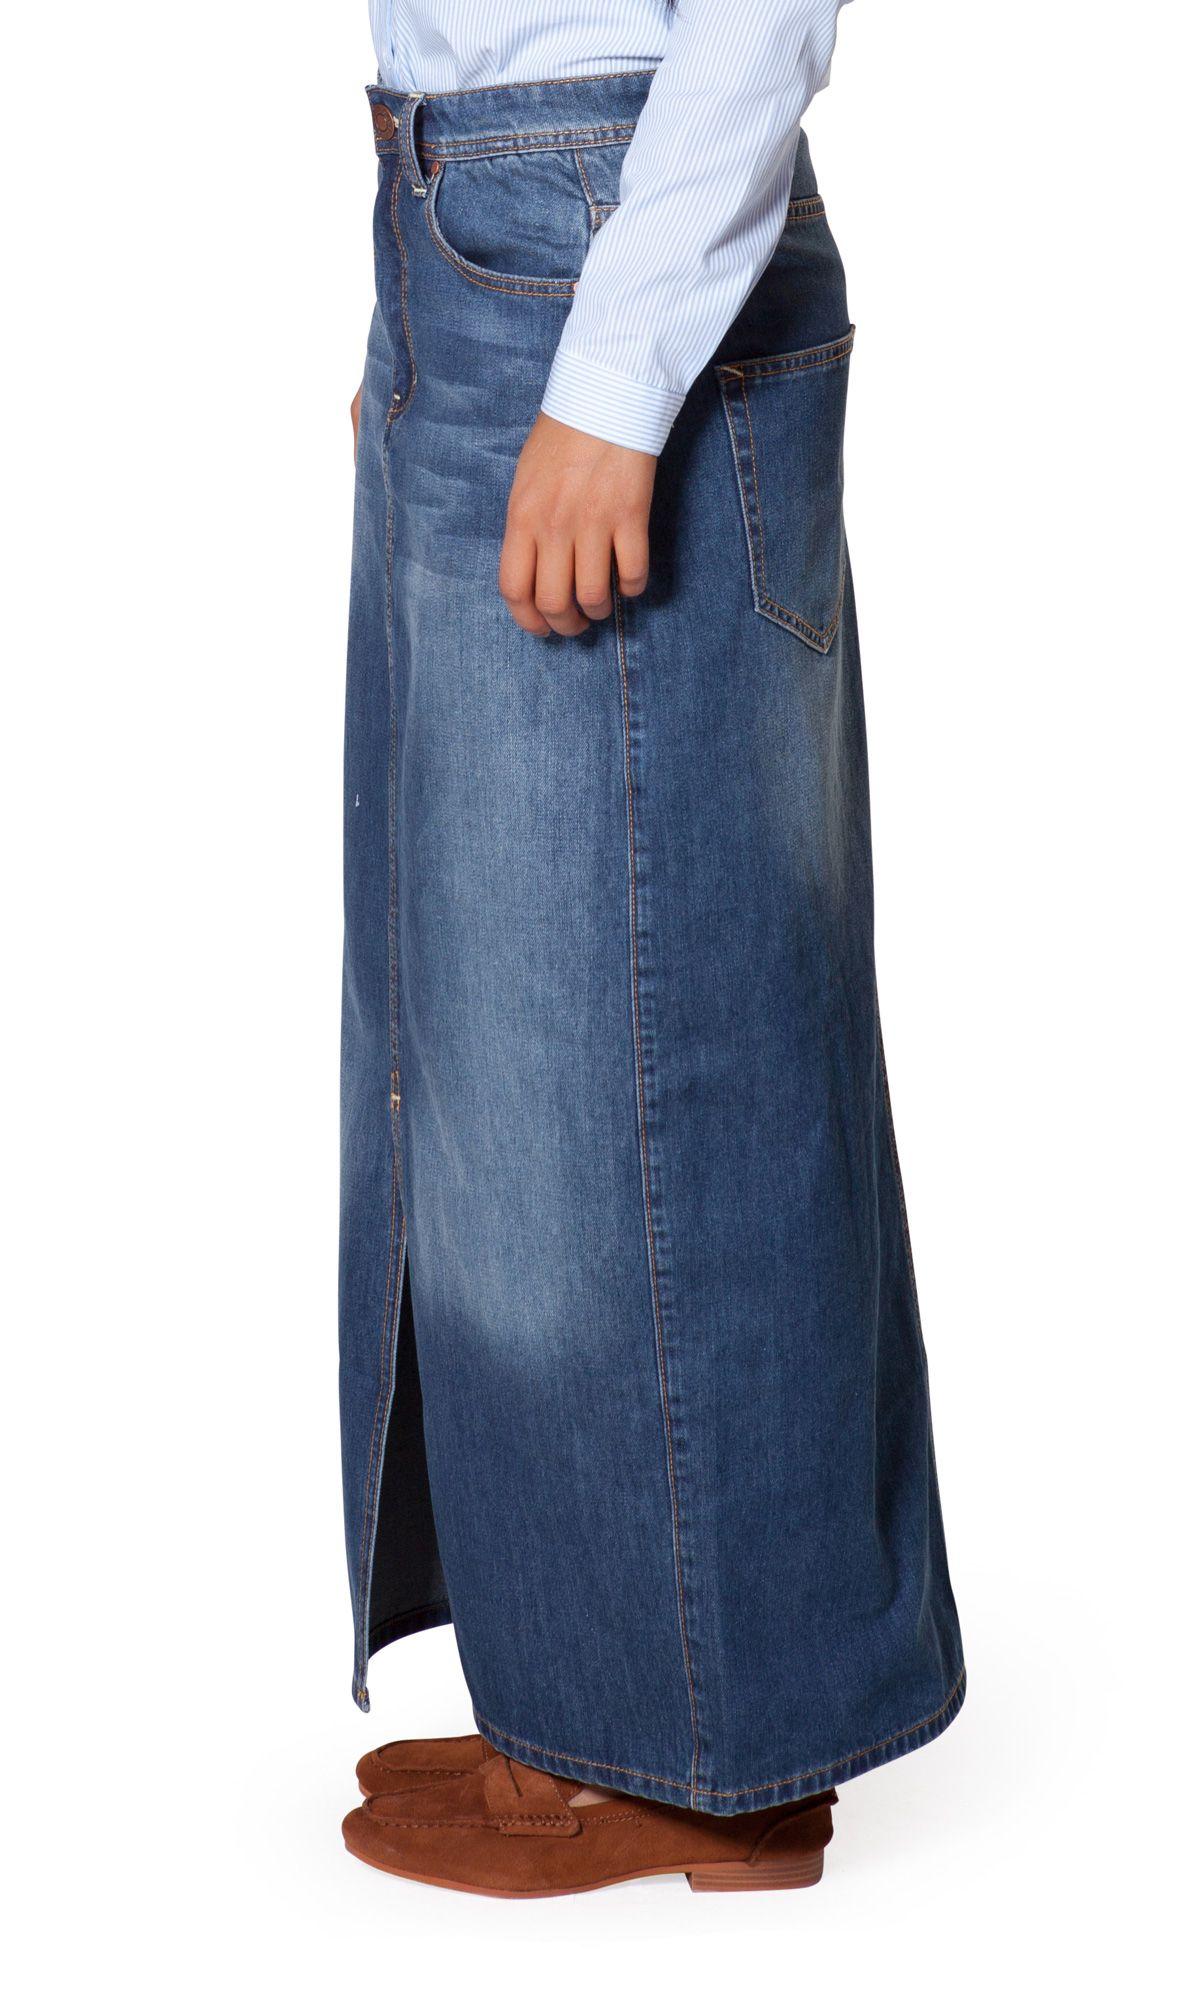 Fashionable USKEES Rachel Long Denim Skirt